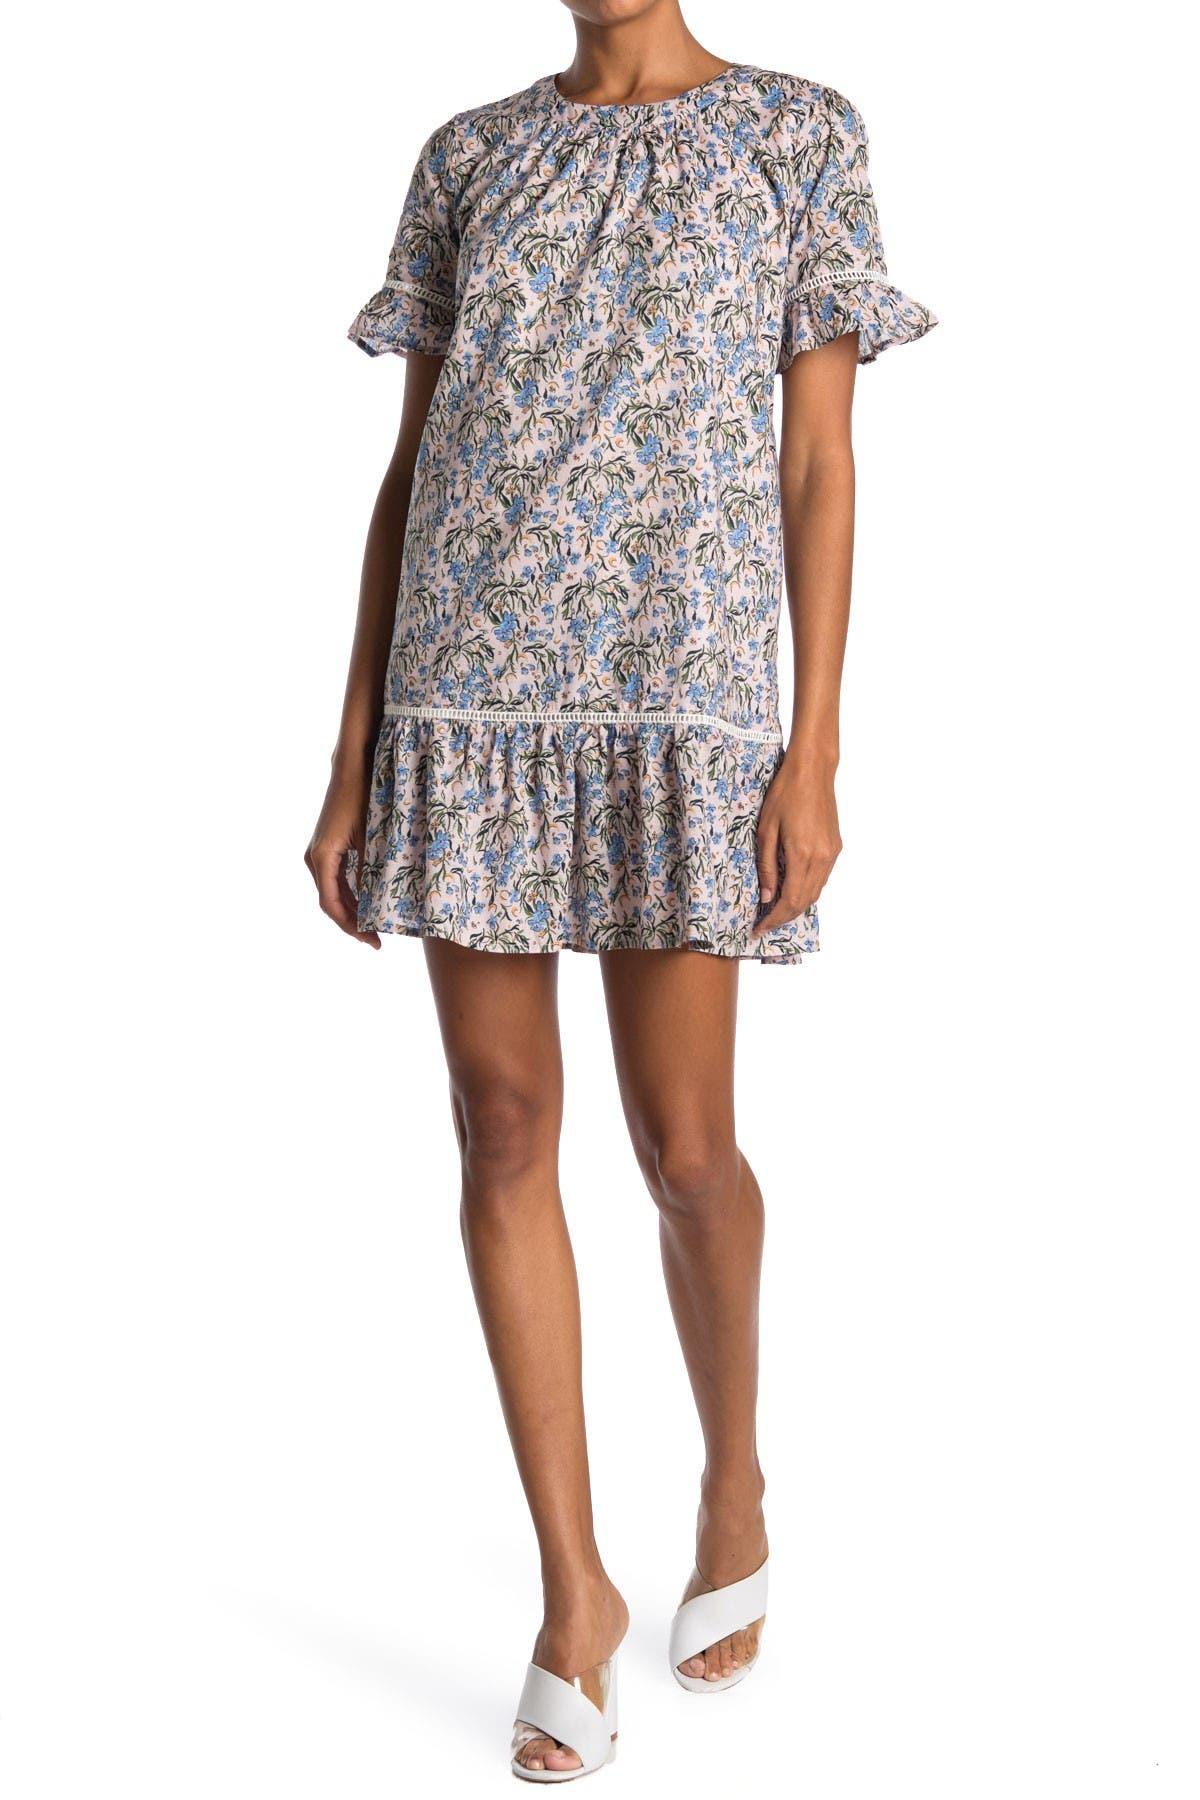 Image of MELLODAY Floral Ruffle Trim Shift Dress